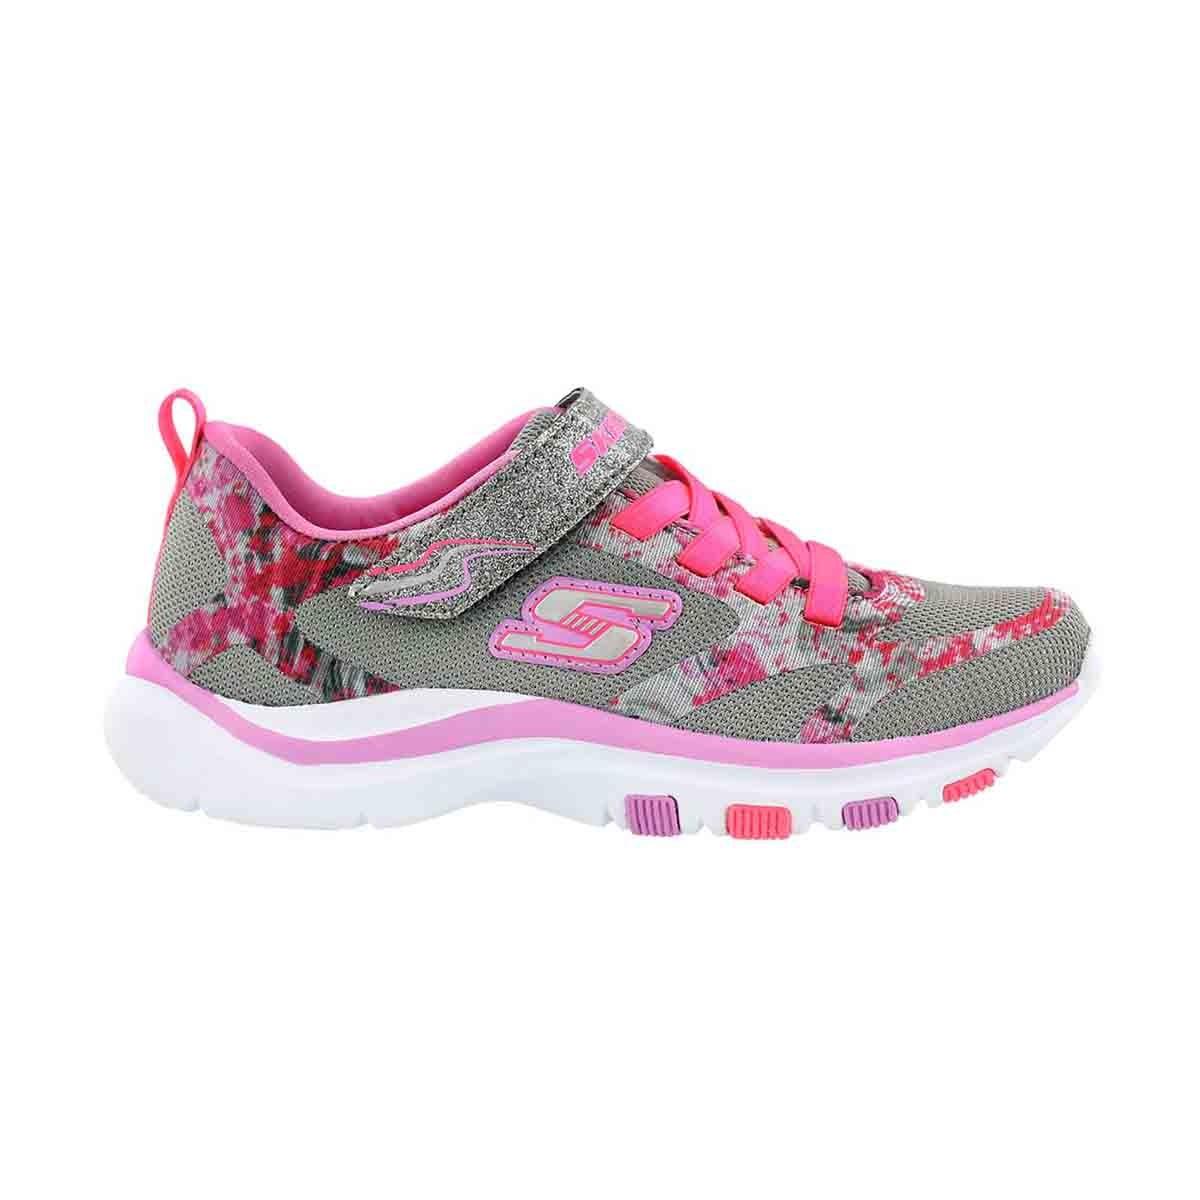 Grls Trainer Lite grey/pink sneaker